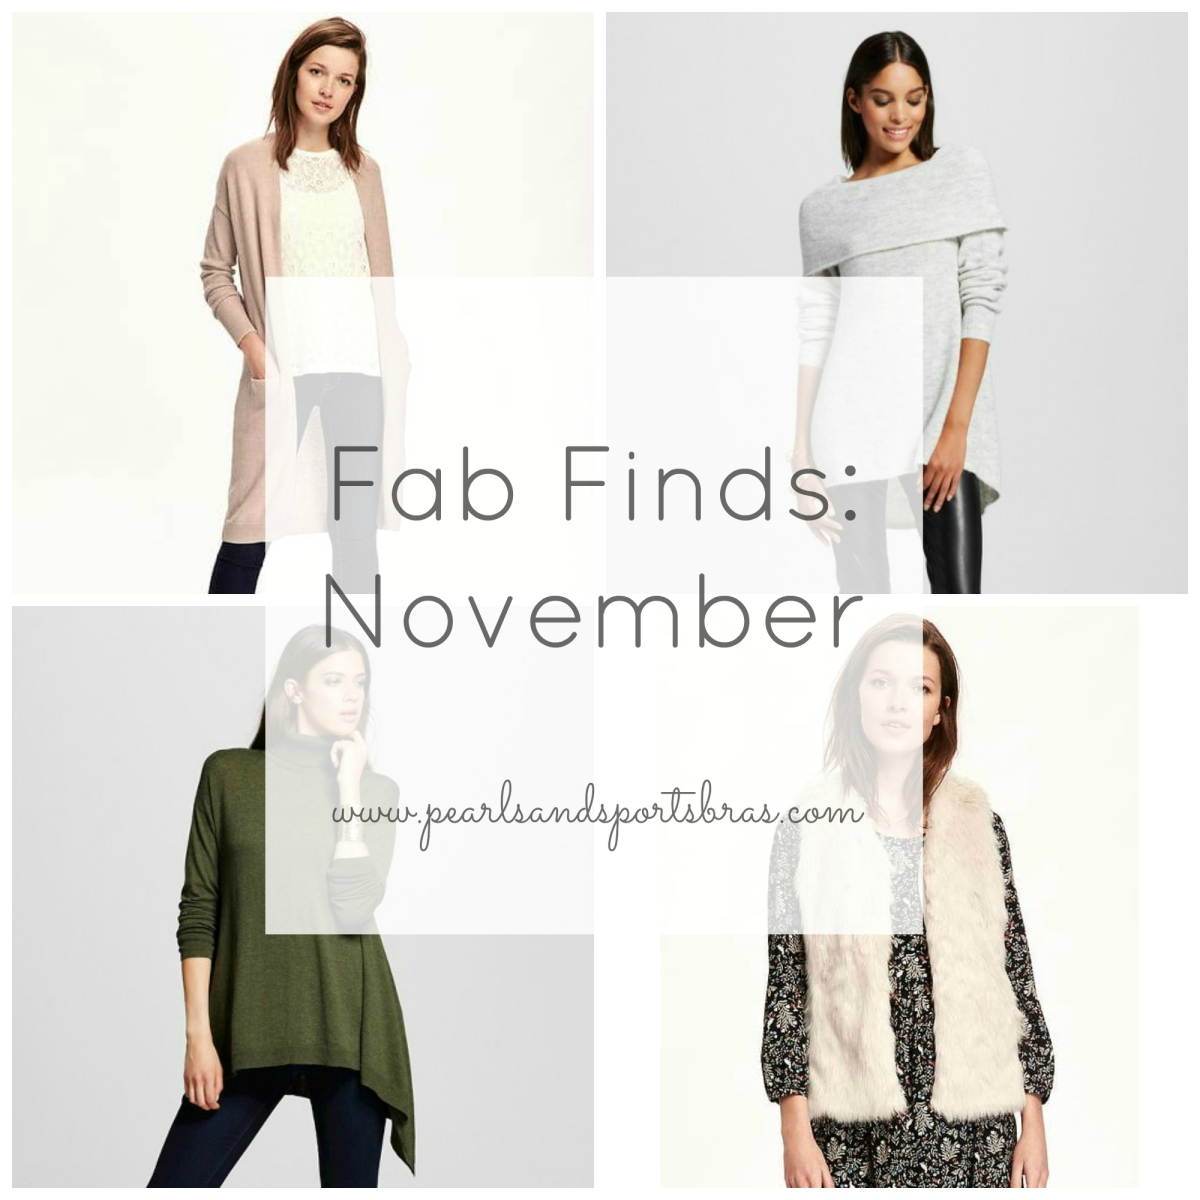 Fab Finds November  www.pearlsandsportsbras.com 